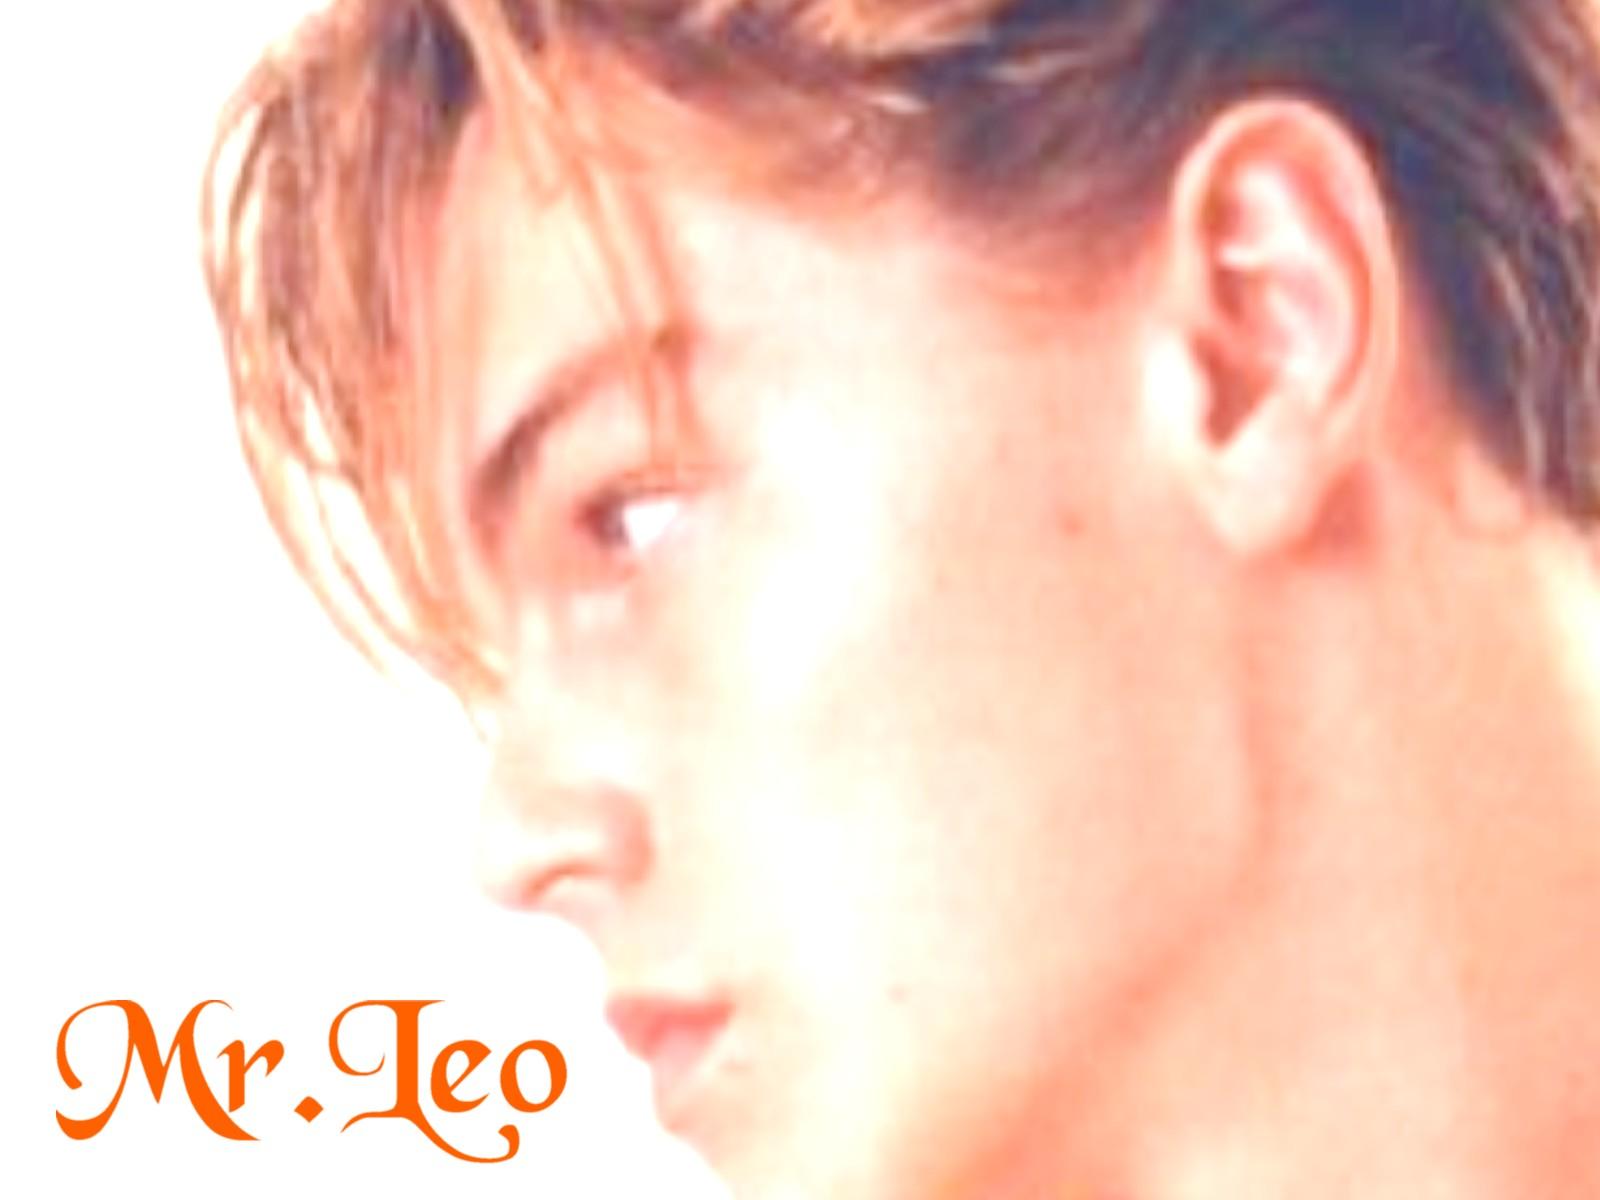 http://1.bp.blogspot.com/_zHx02JB4GE0/TQ0SglHOuHI/AAAAAAAAAQc/-cpxStaygeA/s1600/Leonardo+Di+Caprio+Wallpaper+%25286%2529.jpg